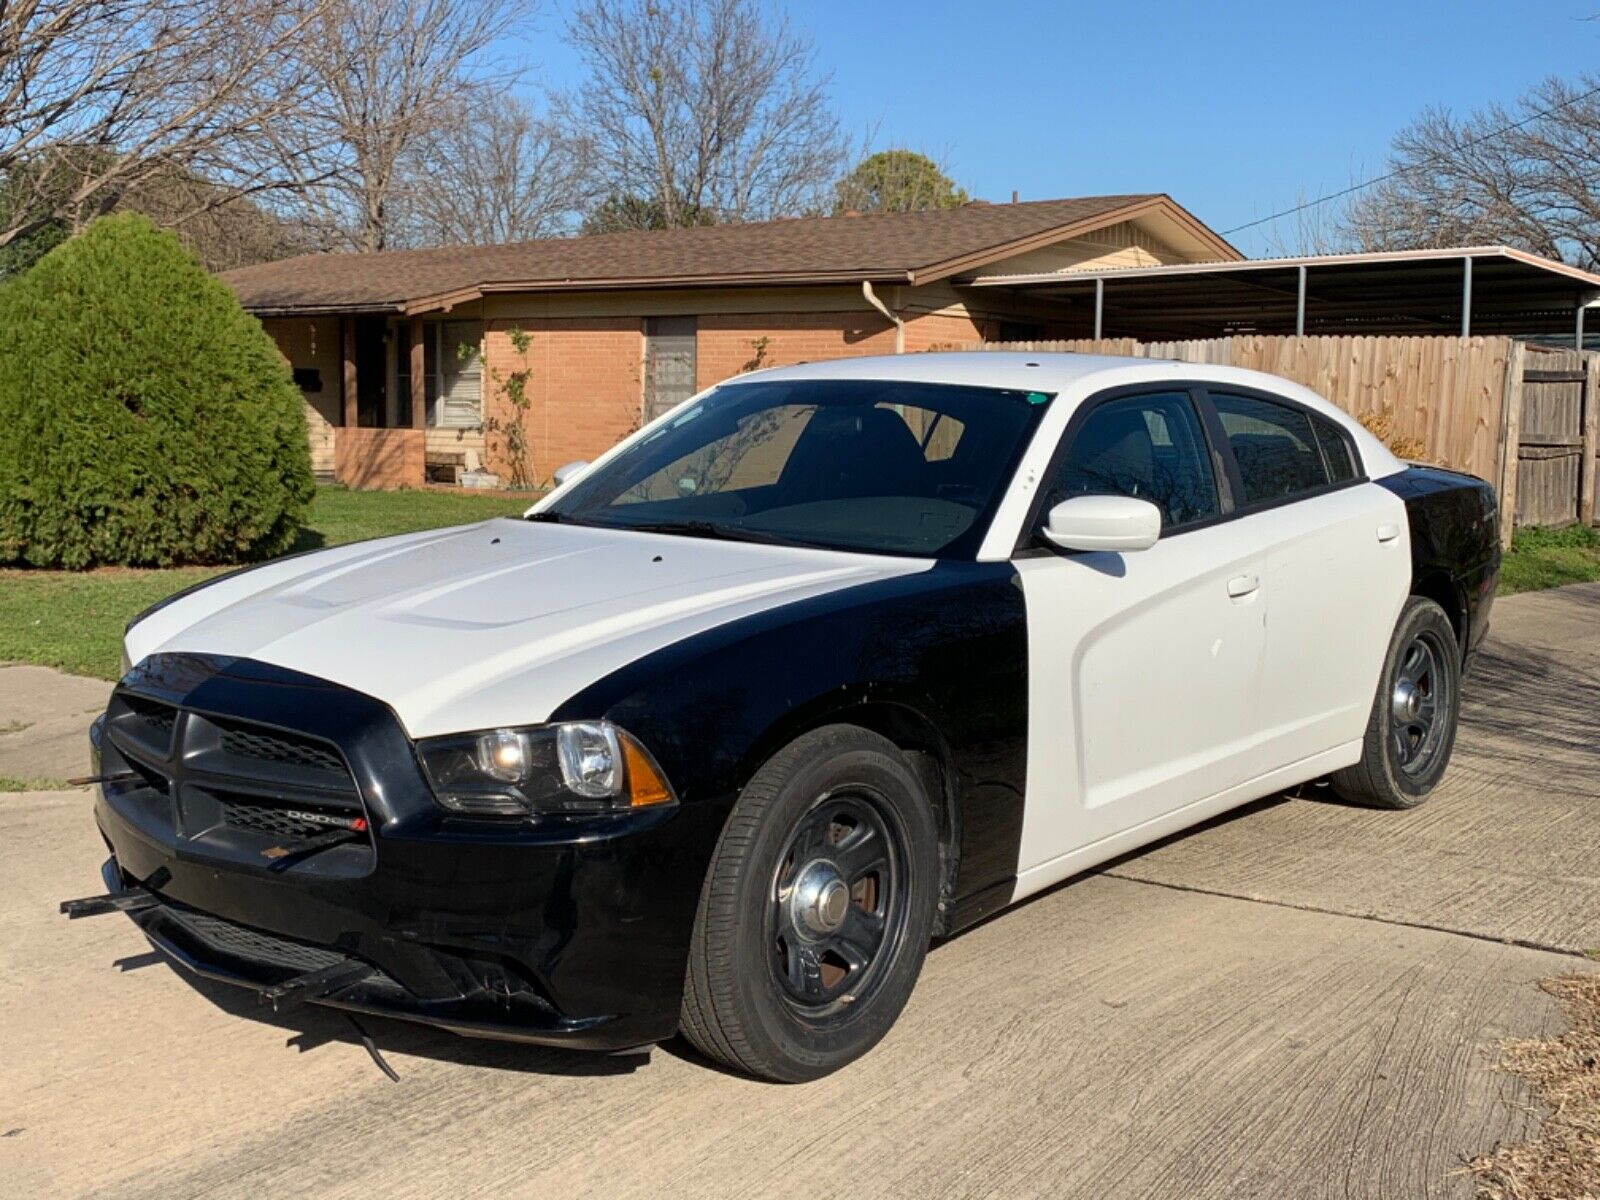 2012 Dodge Charger SE 2012 Dodge Charger SE Sedan Cop Ex Police car AS IS NO RESERVE CLEAN TITLE